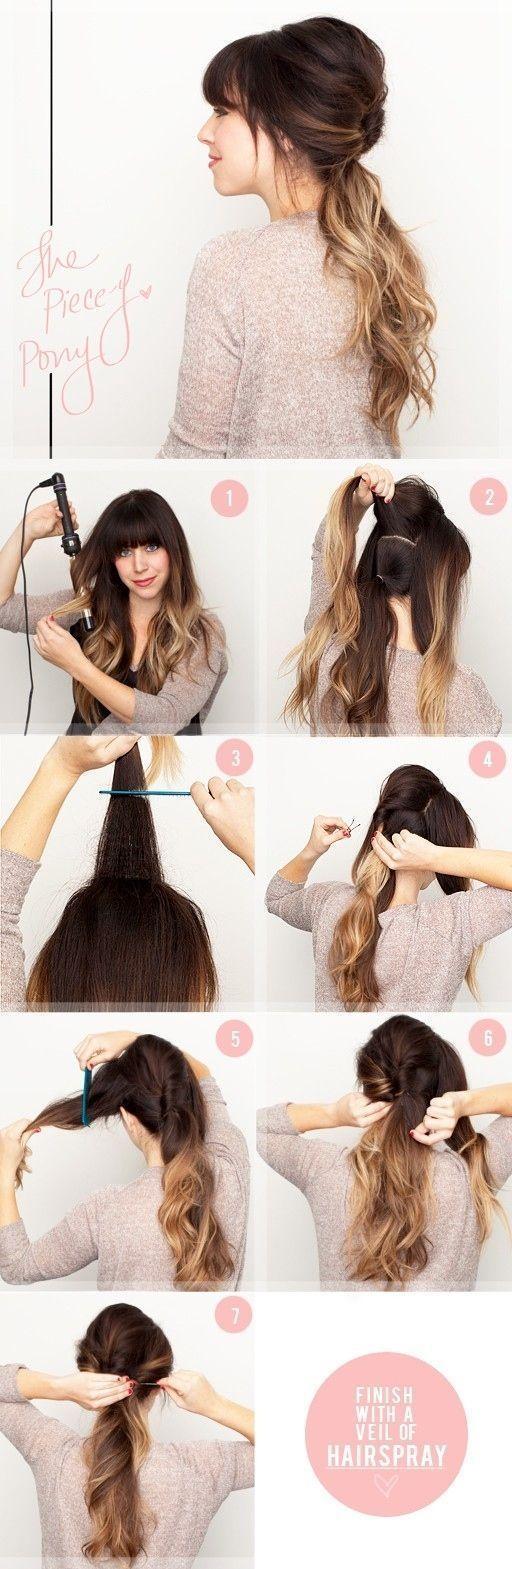 Cool diy hairstyles for girls pei nas mi pelo no